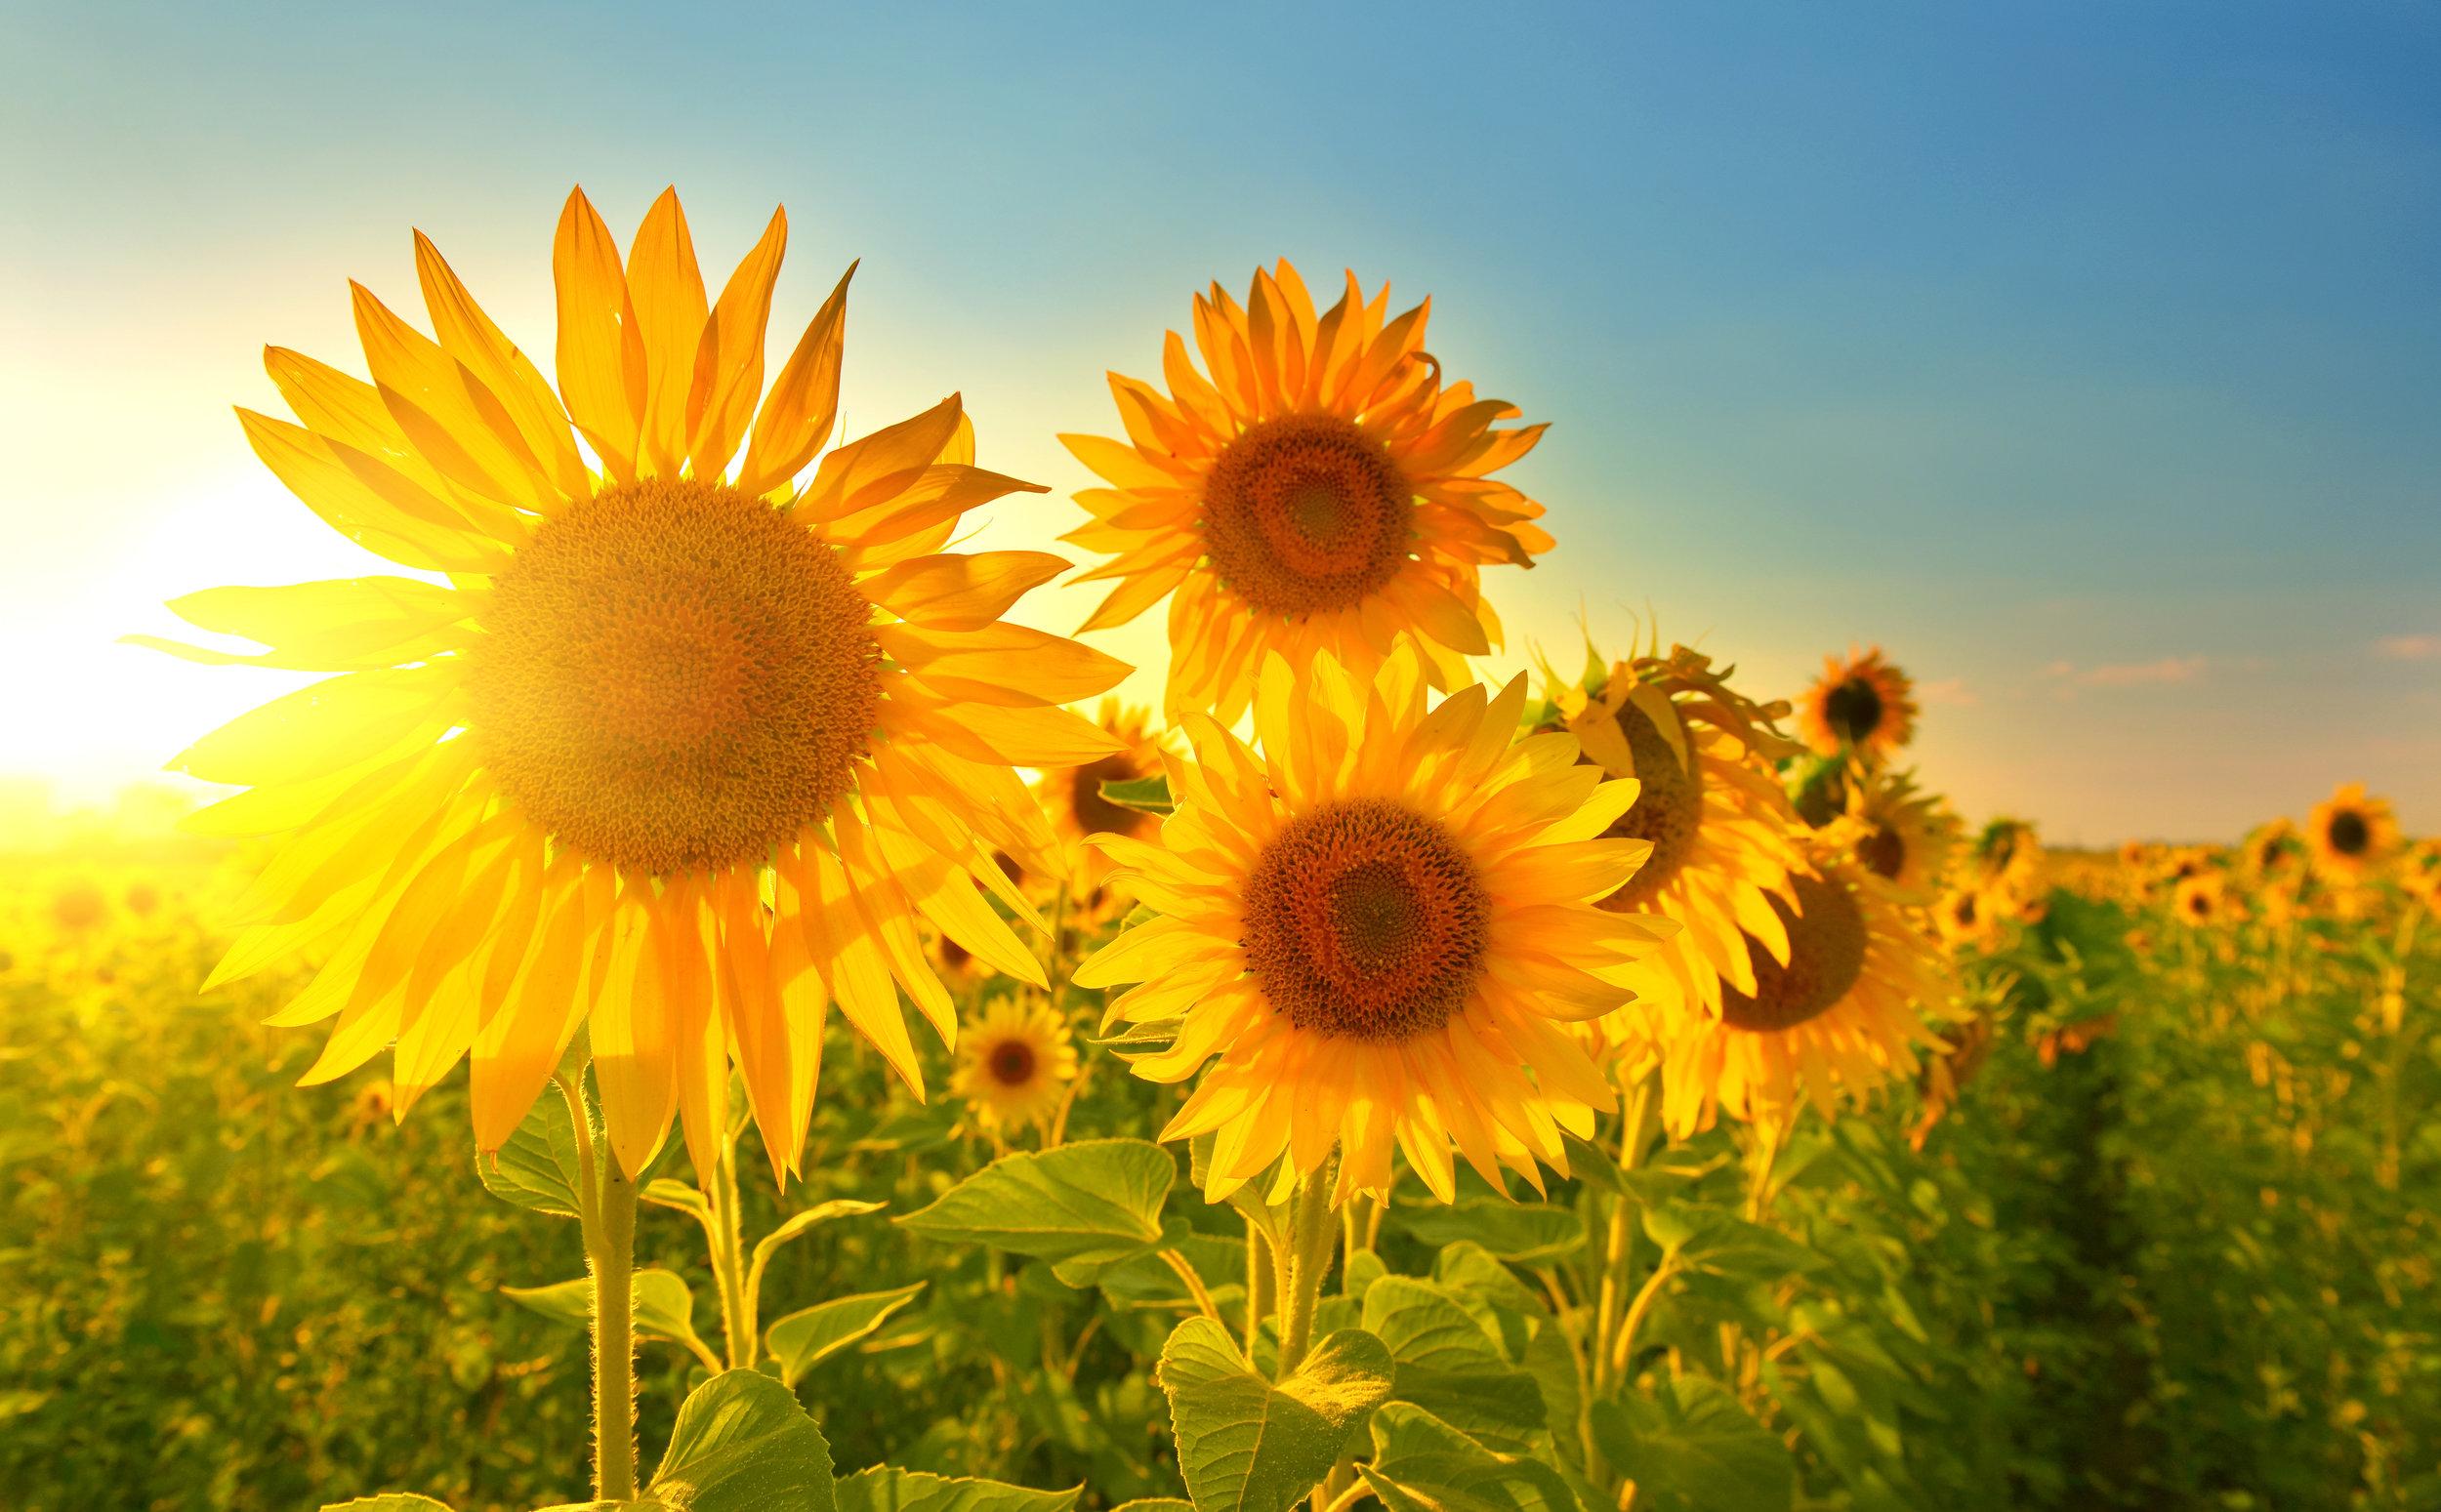 Sunflowers-field.jpg